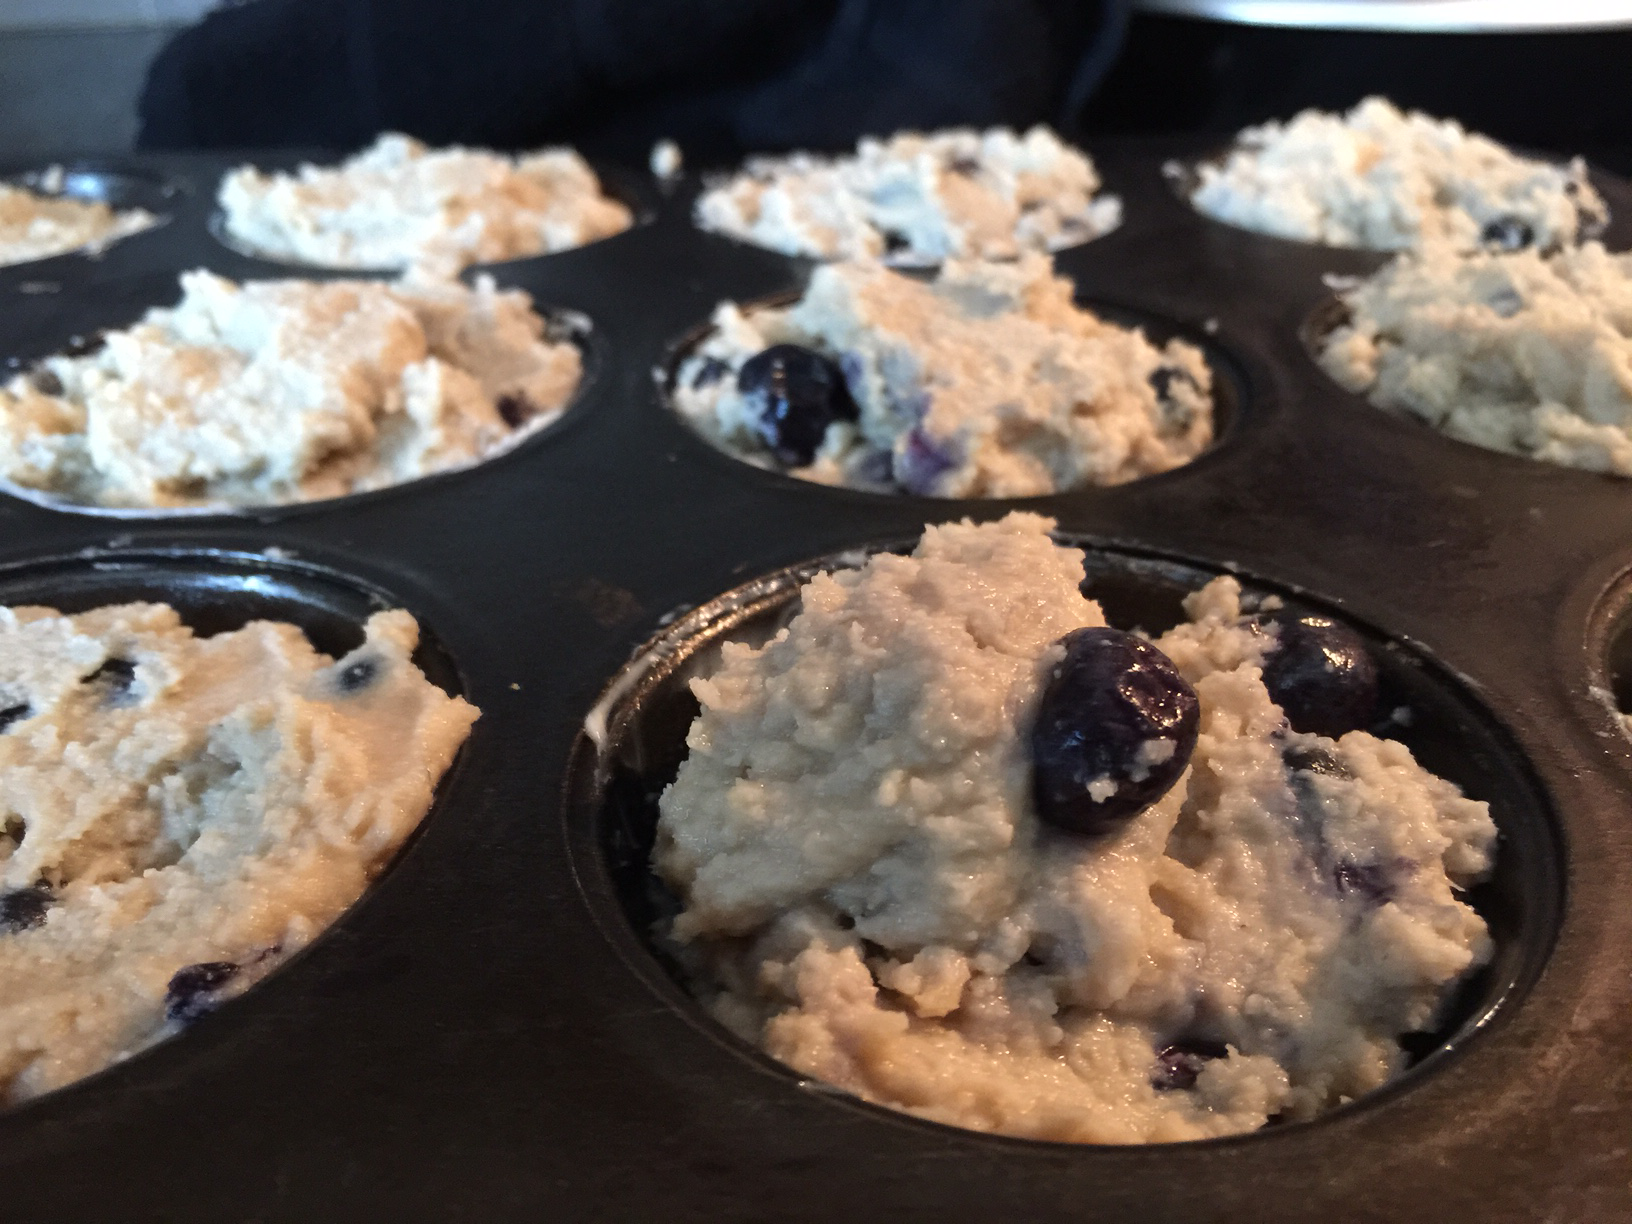 eating-understood-tins-before-baking.png